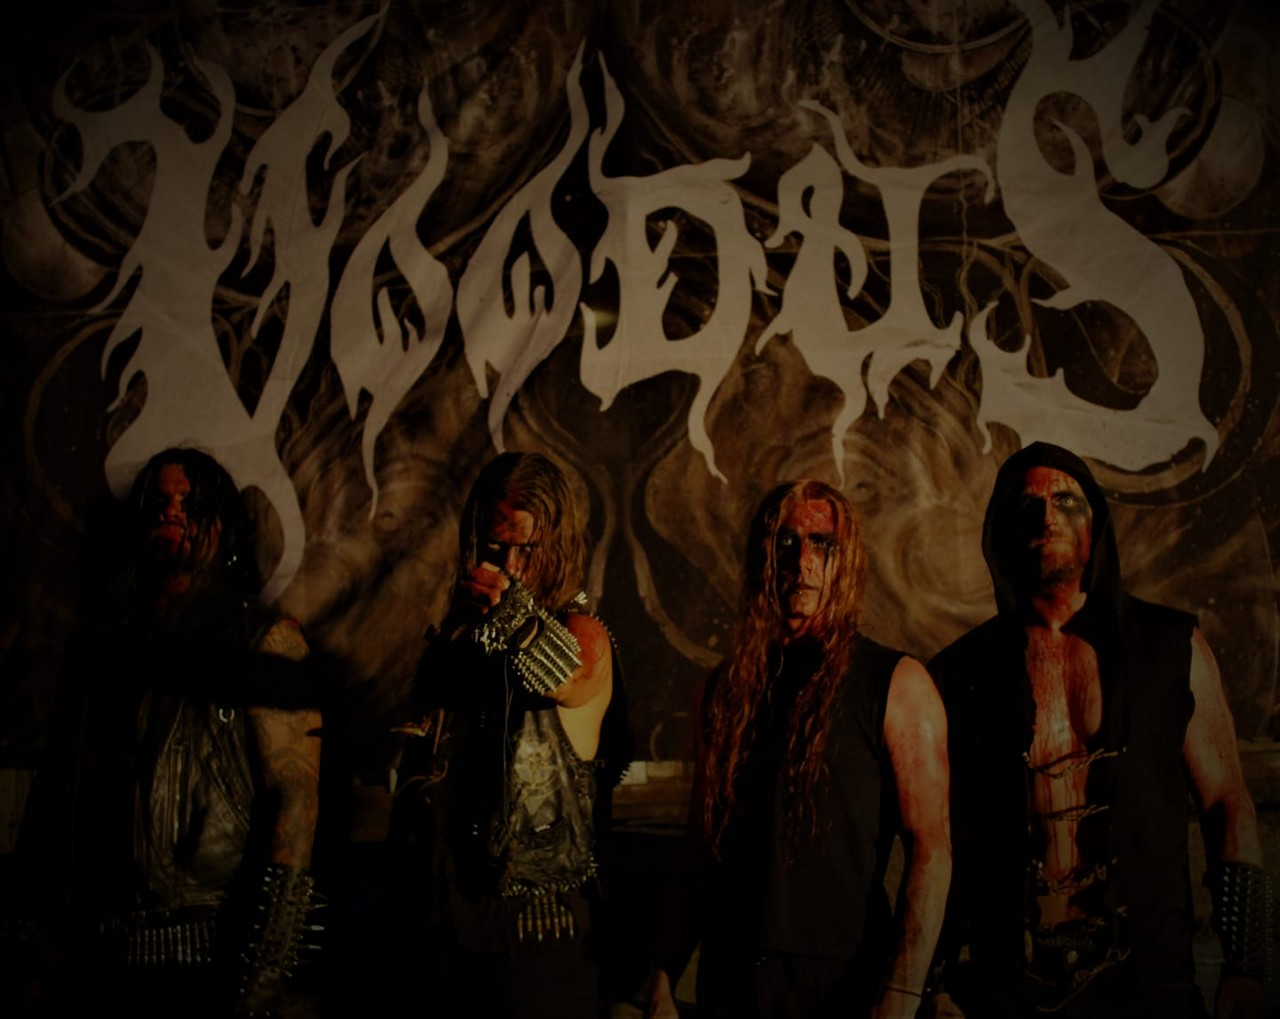 Voodus - Photo